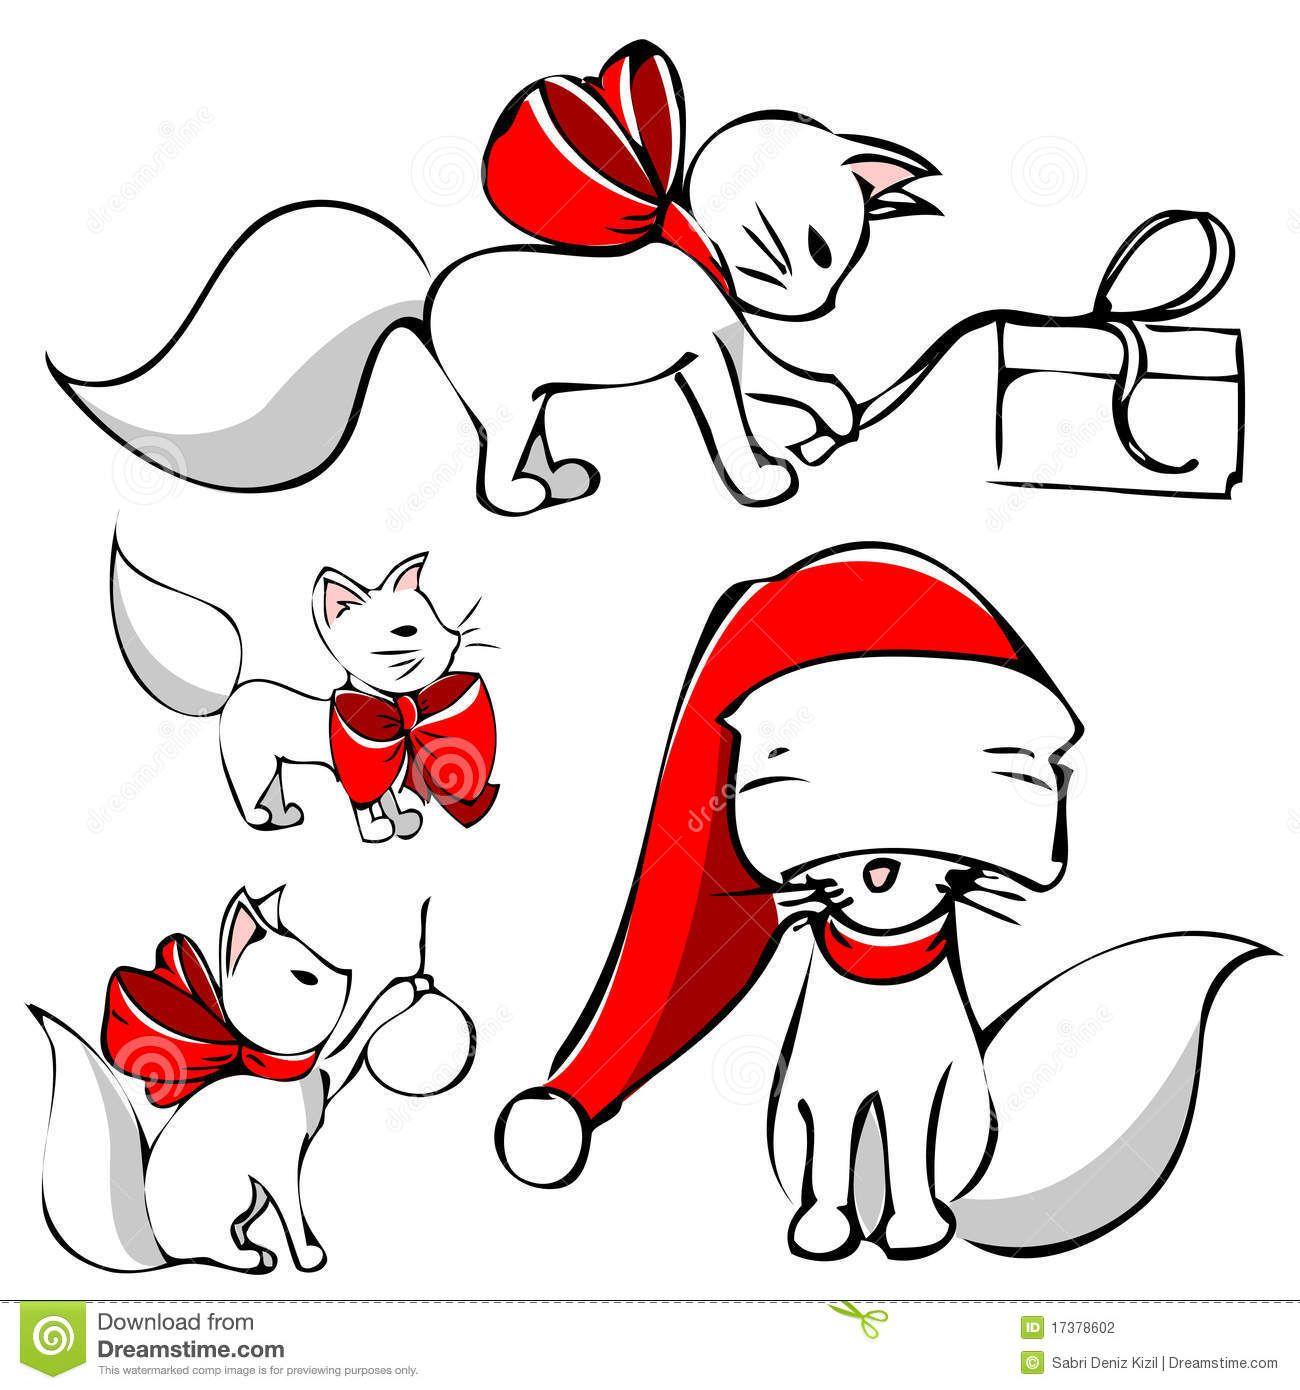 Curiosity killed the Christmas cat Xmas drawing, Easy